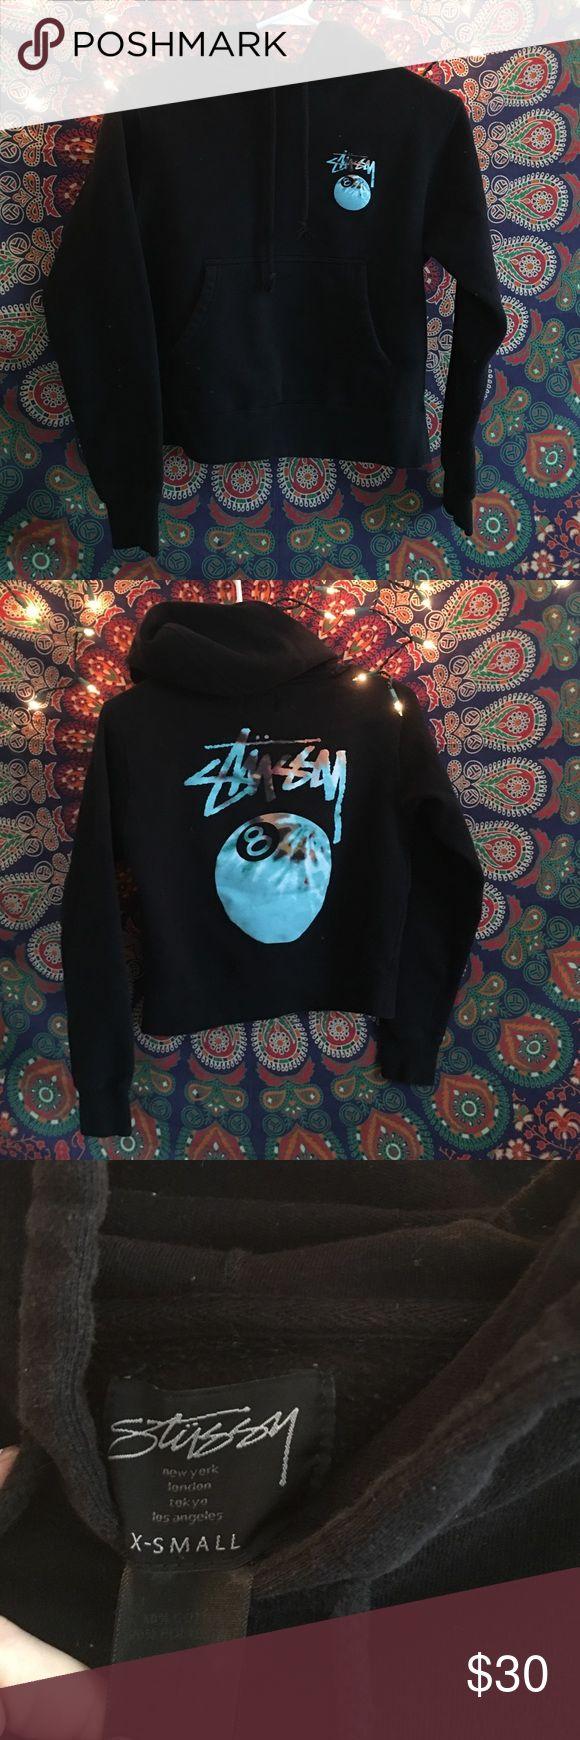 Stüssy cropped hoodie size XS Stüssy cropped black/tie dye hoodie size XS Stussy Tops Sweatshirts & Hoodies